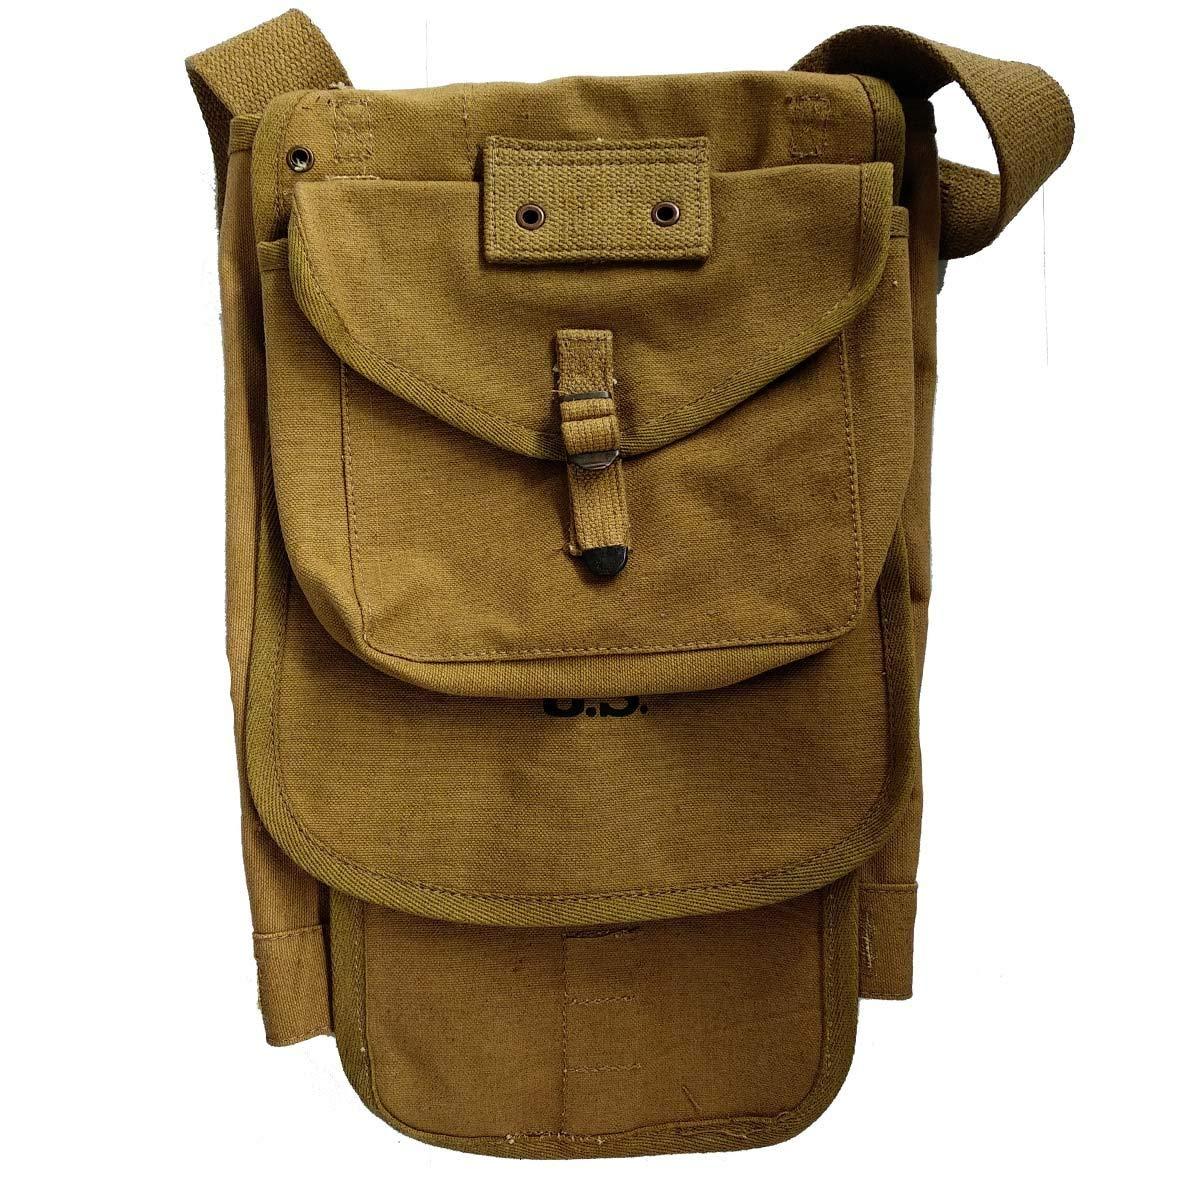 ce6f09f9b9fa Buy Wwii Backpack World War 2 Vintage Style Heavy Duty Canvas-black ...